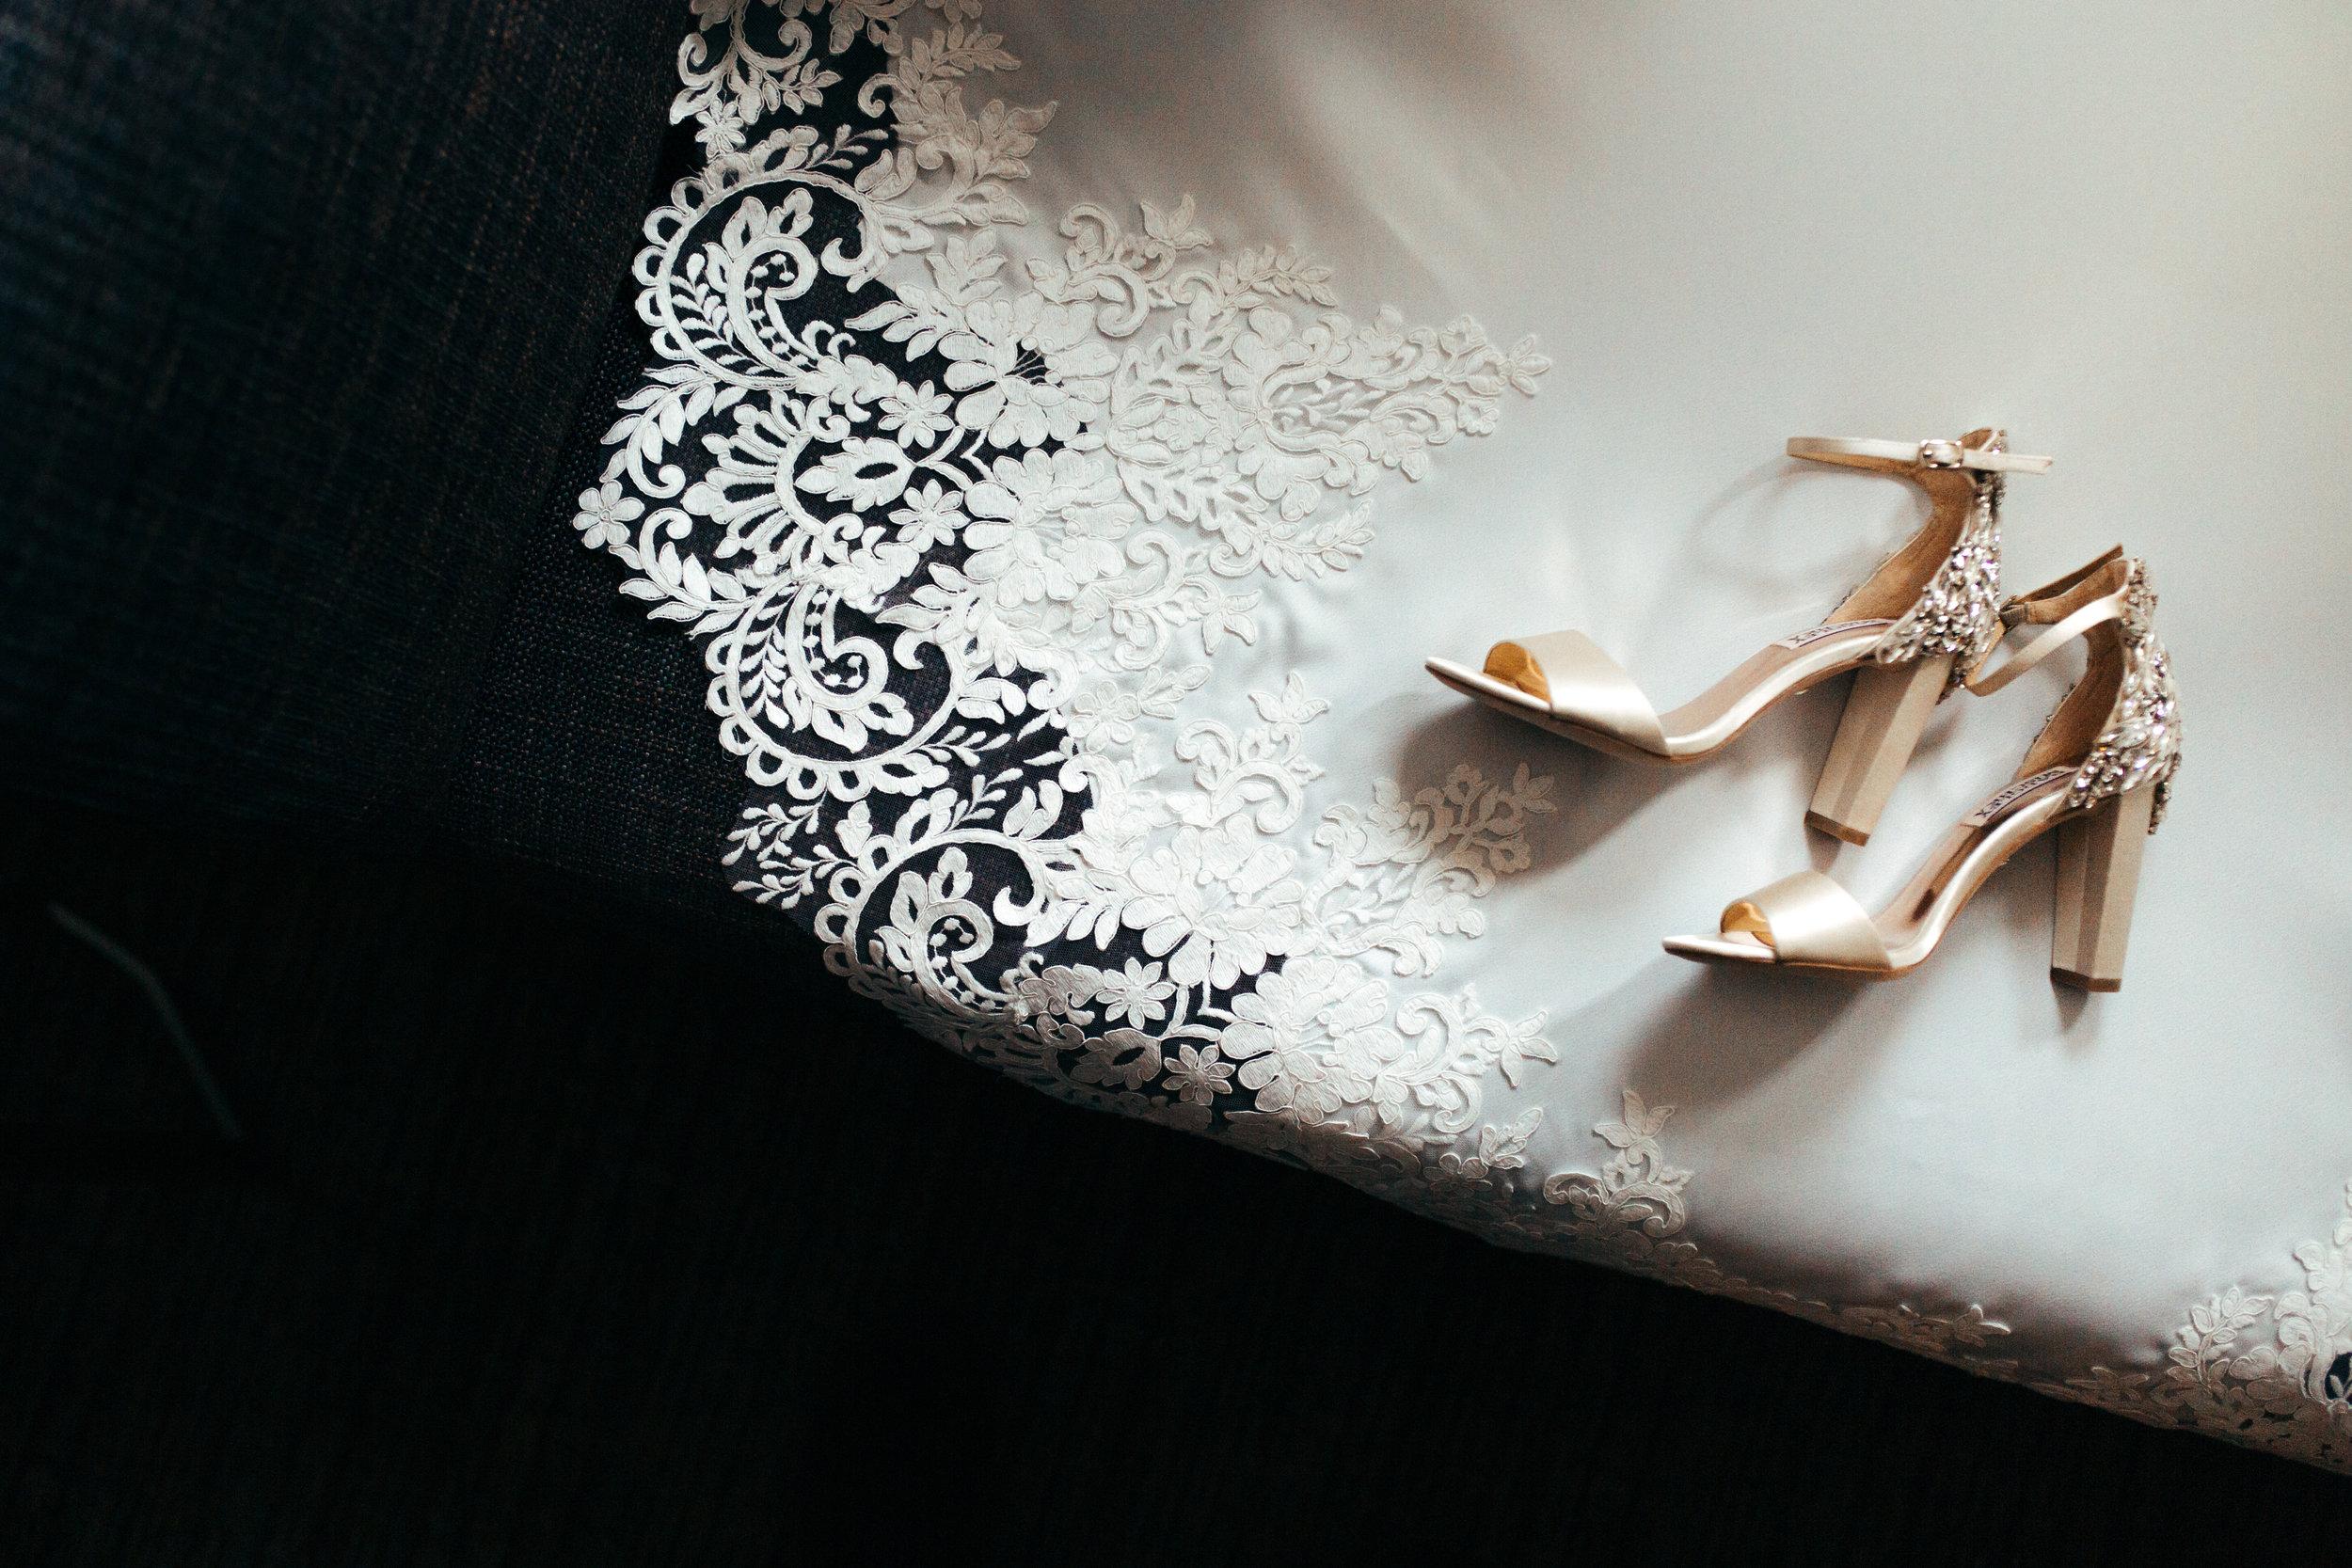 Mindy&Jared-wedding-by-LadiesAndGentlemen-by-Matija-Vuri-1677.jpg